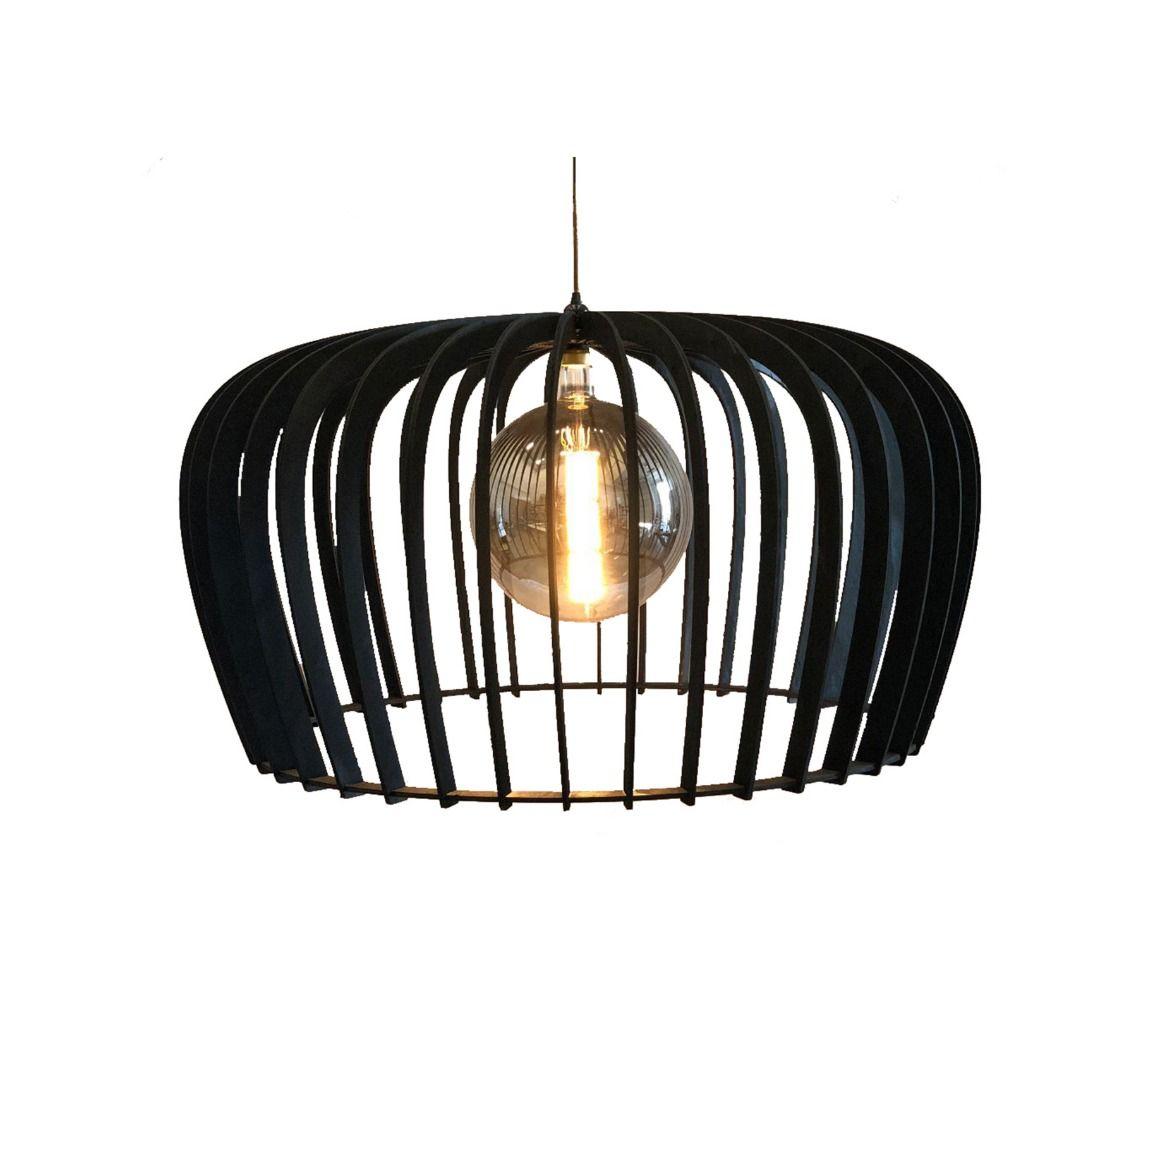 Citrouille Hanglamp 75cm Hanglamp Led Lamp Lampen